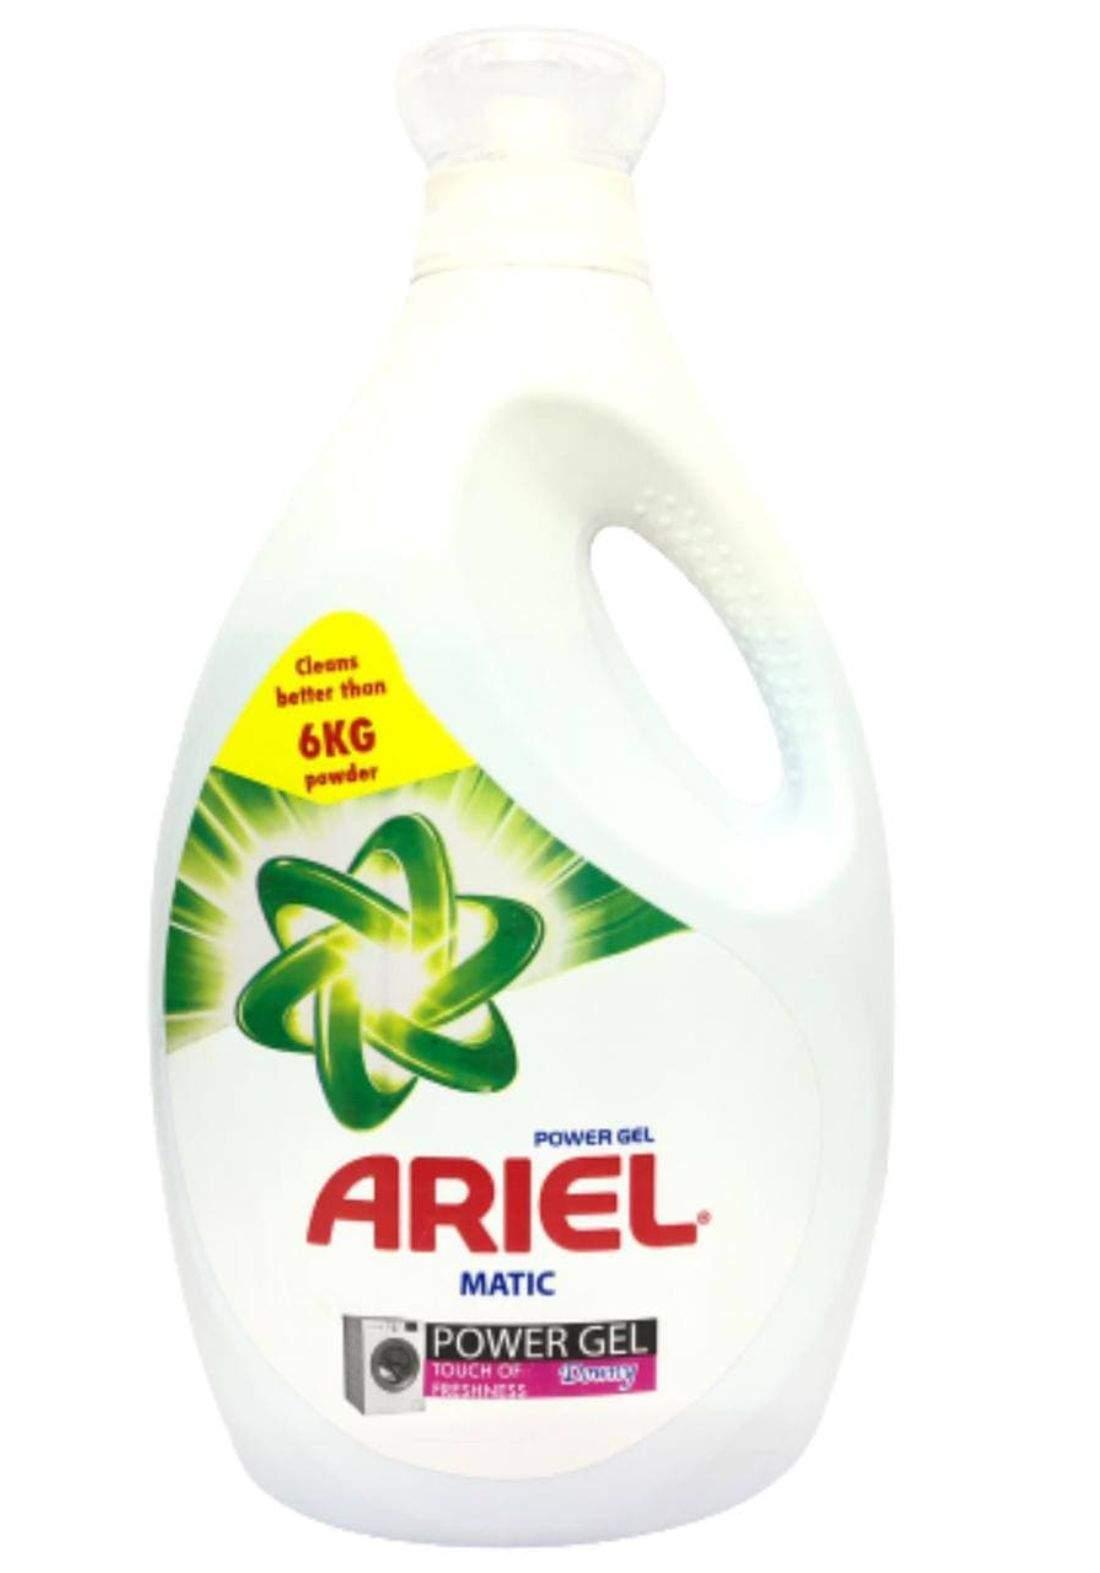 Ariel power gel 3L اريل بور جل